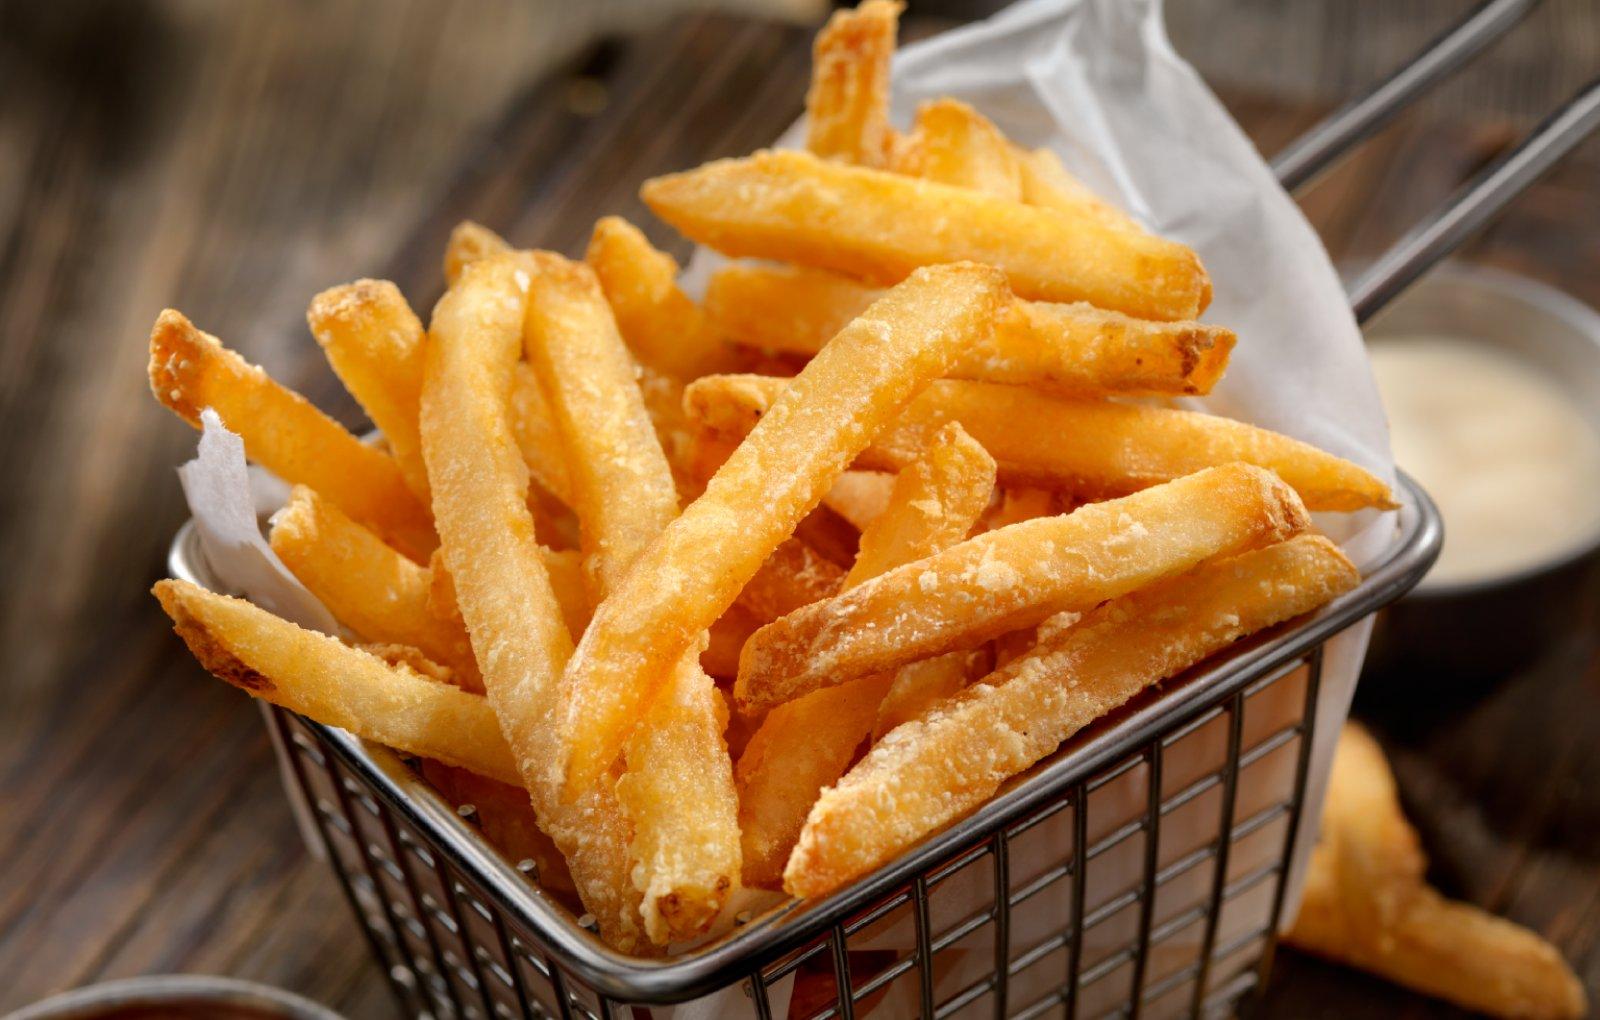 Golden Phoenix shoestring cut crispy fries deep fryed.